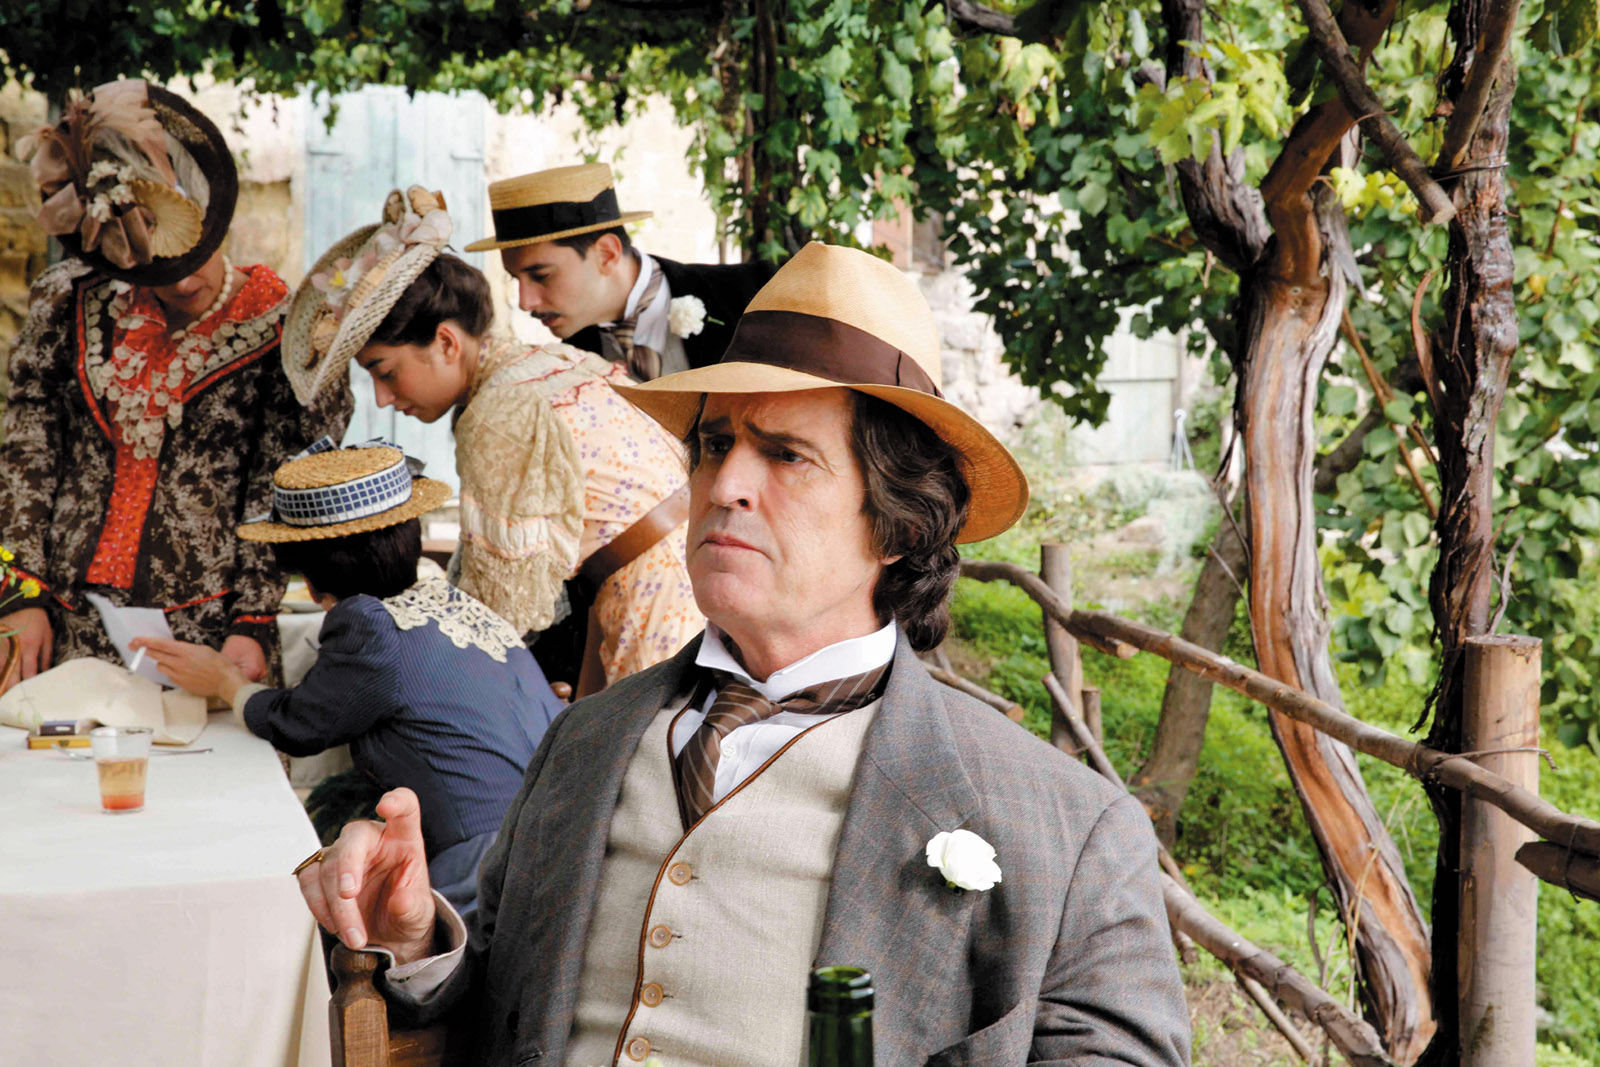 Rupert Everett as Oscar Wilde in The Happy Prince